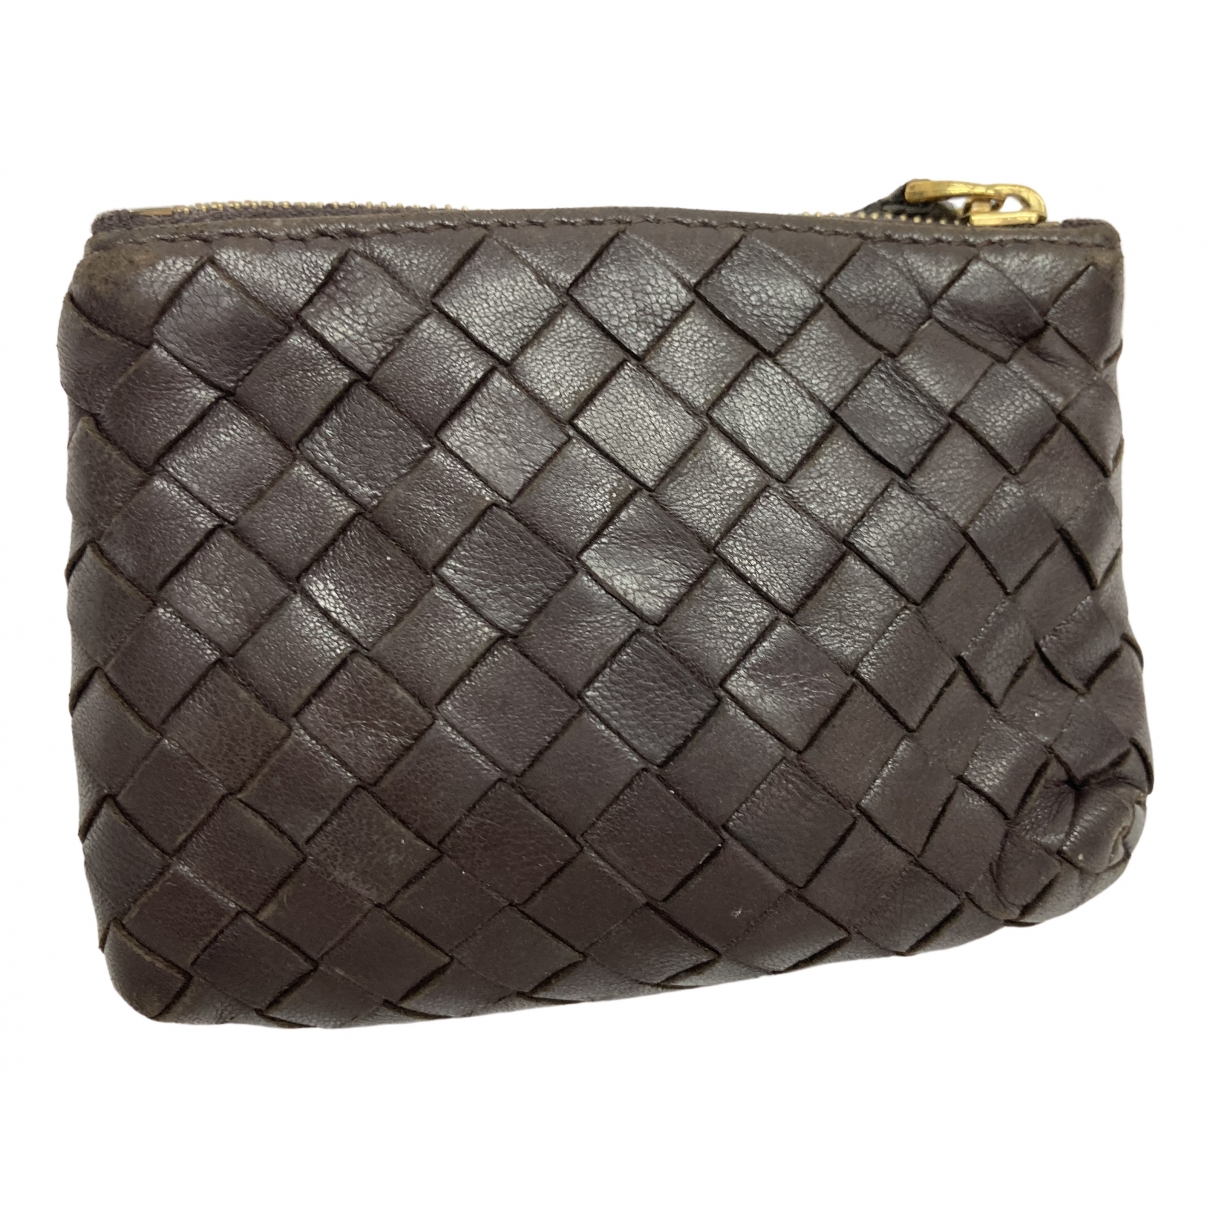 Bottega Veneta \N Brown Leather Purses, wallet & cases for Women \N